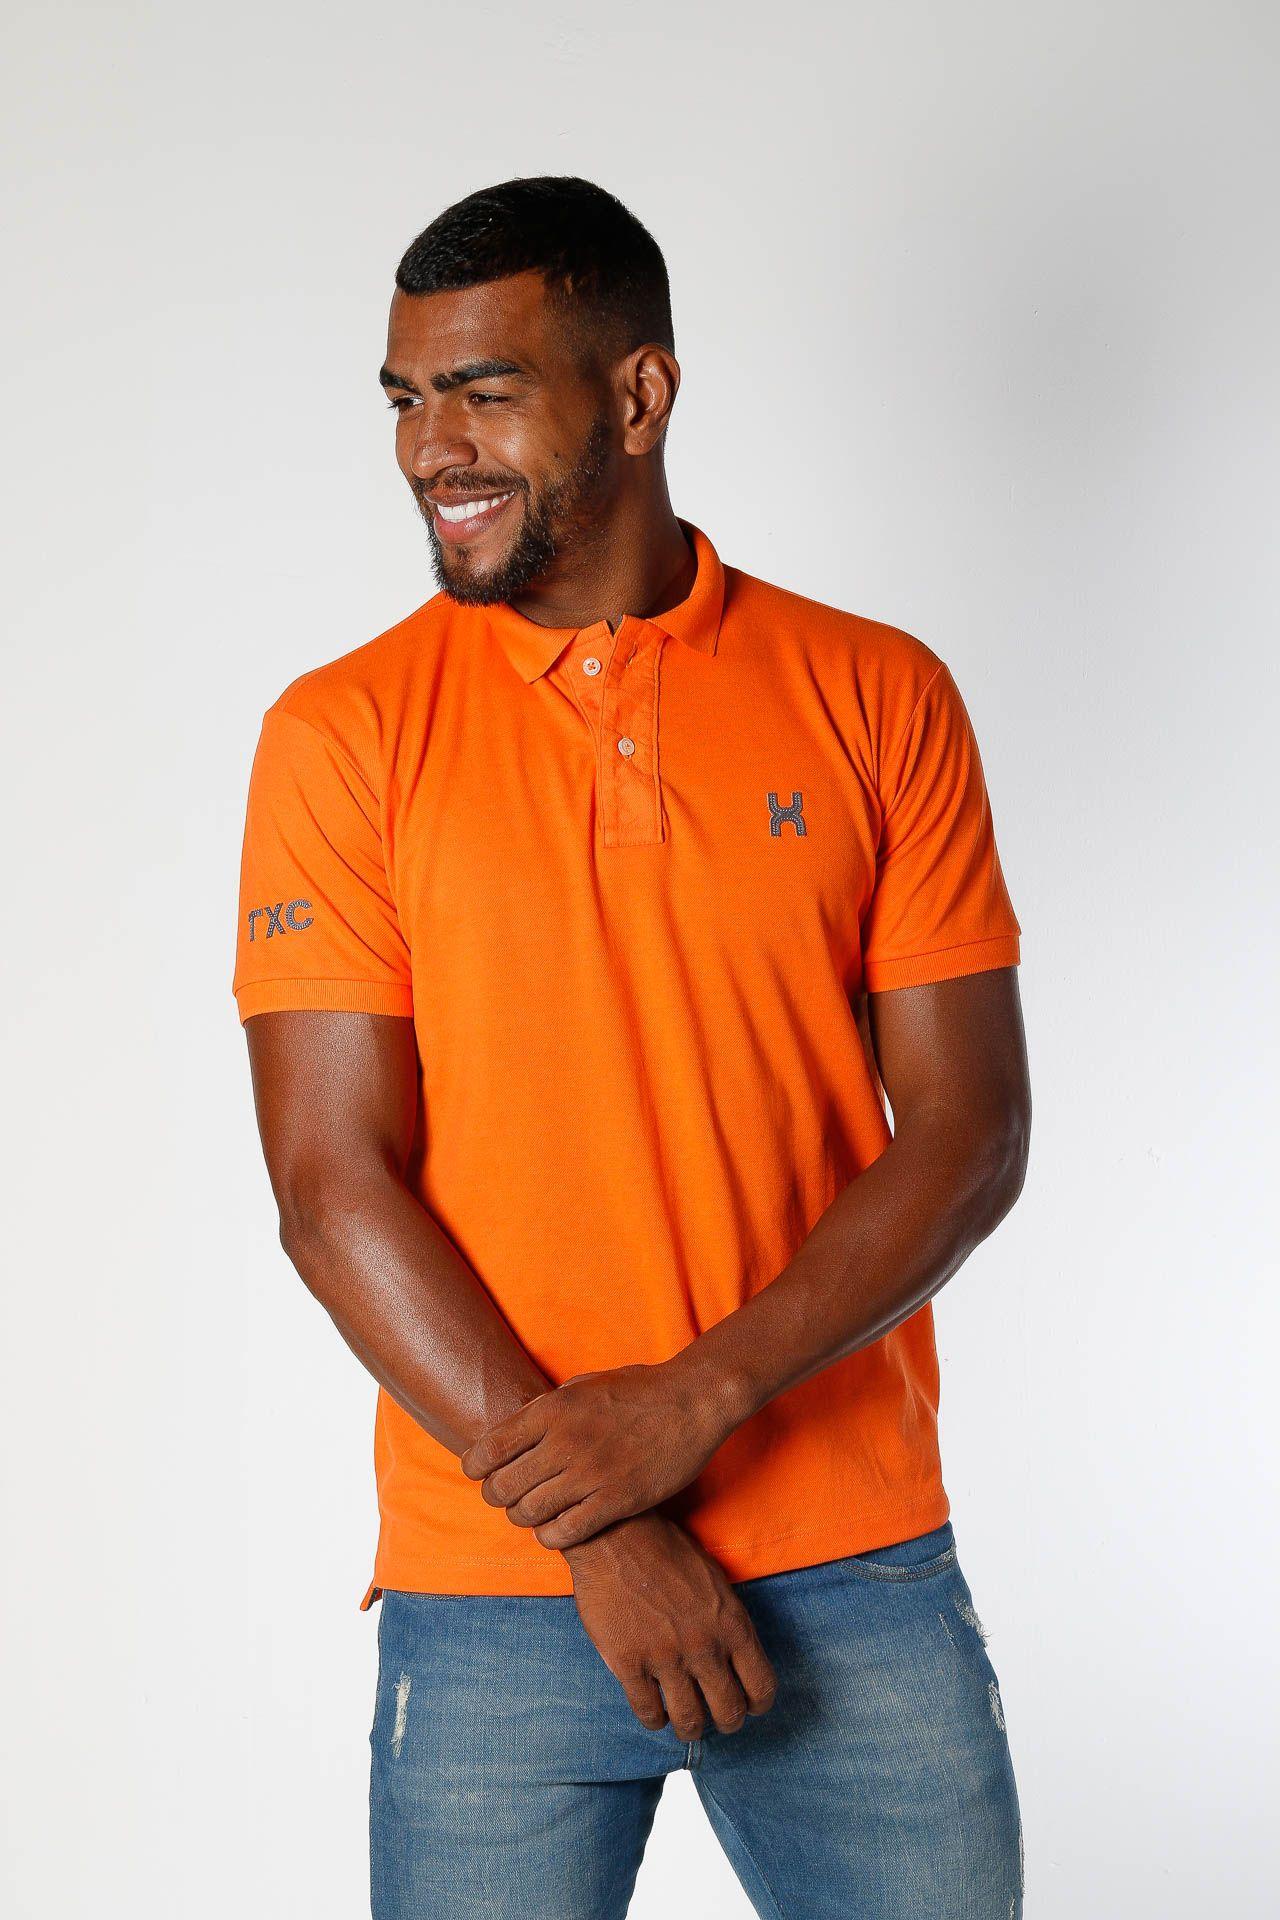 Camiseta Masculina Txc Gola Polo Algodão Lisa - Laranja